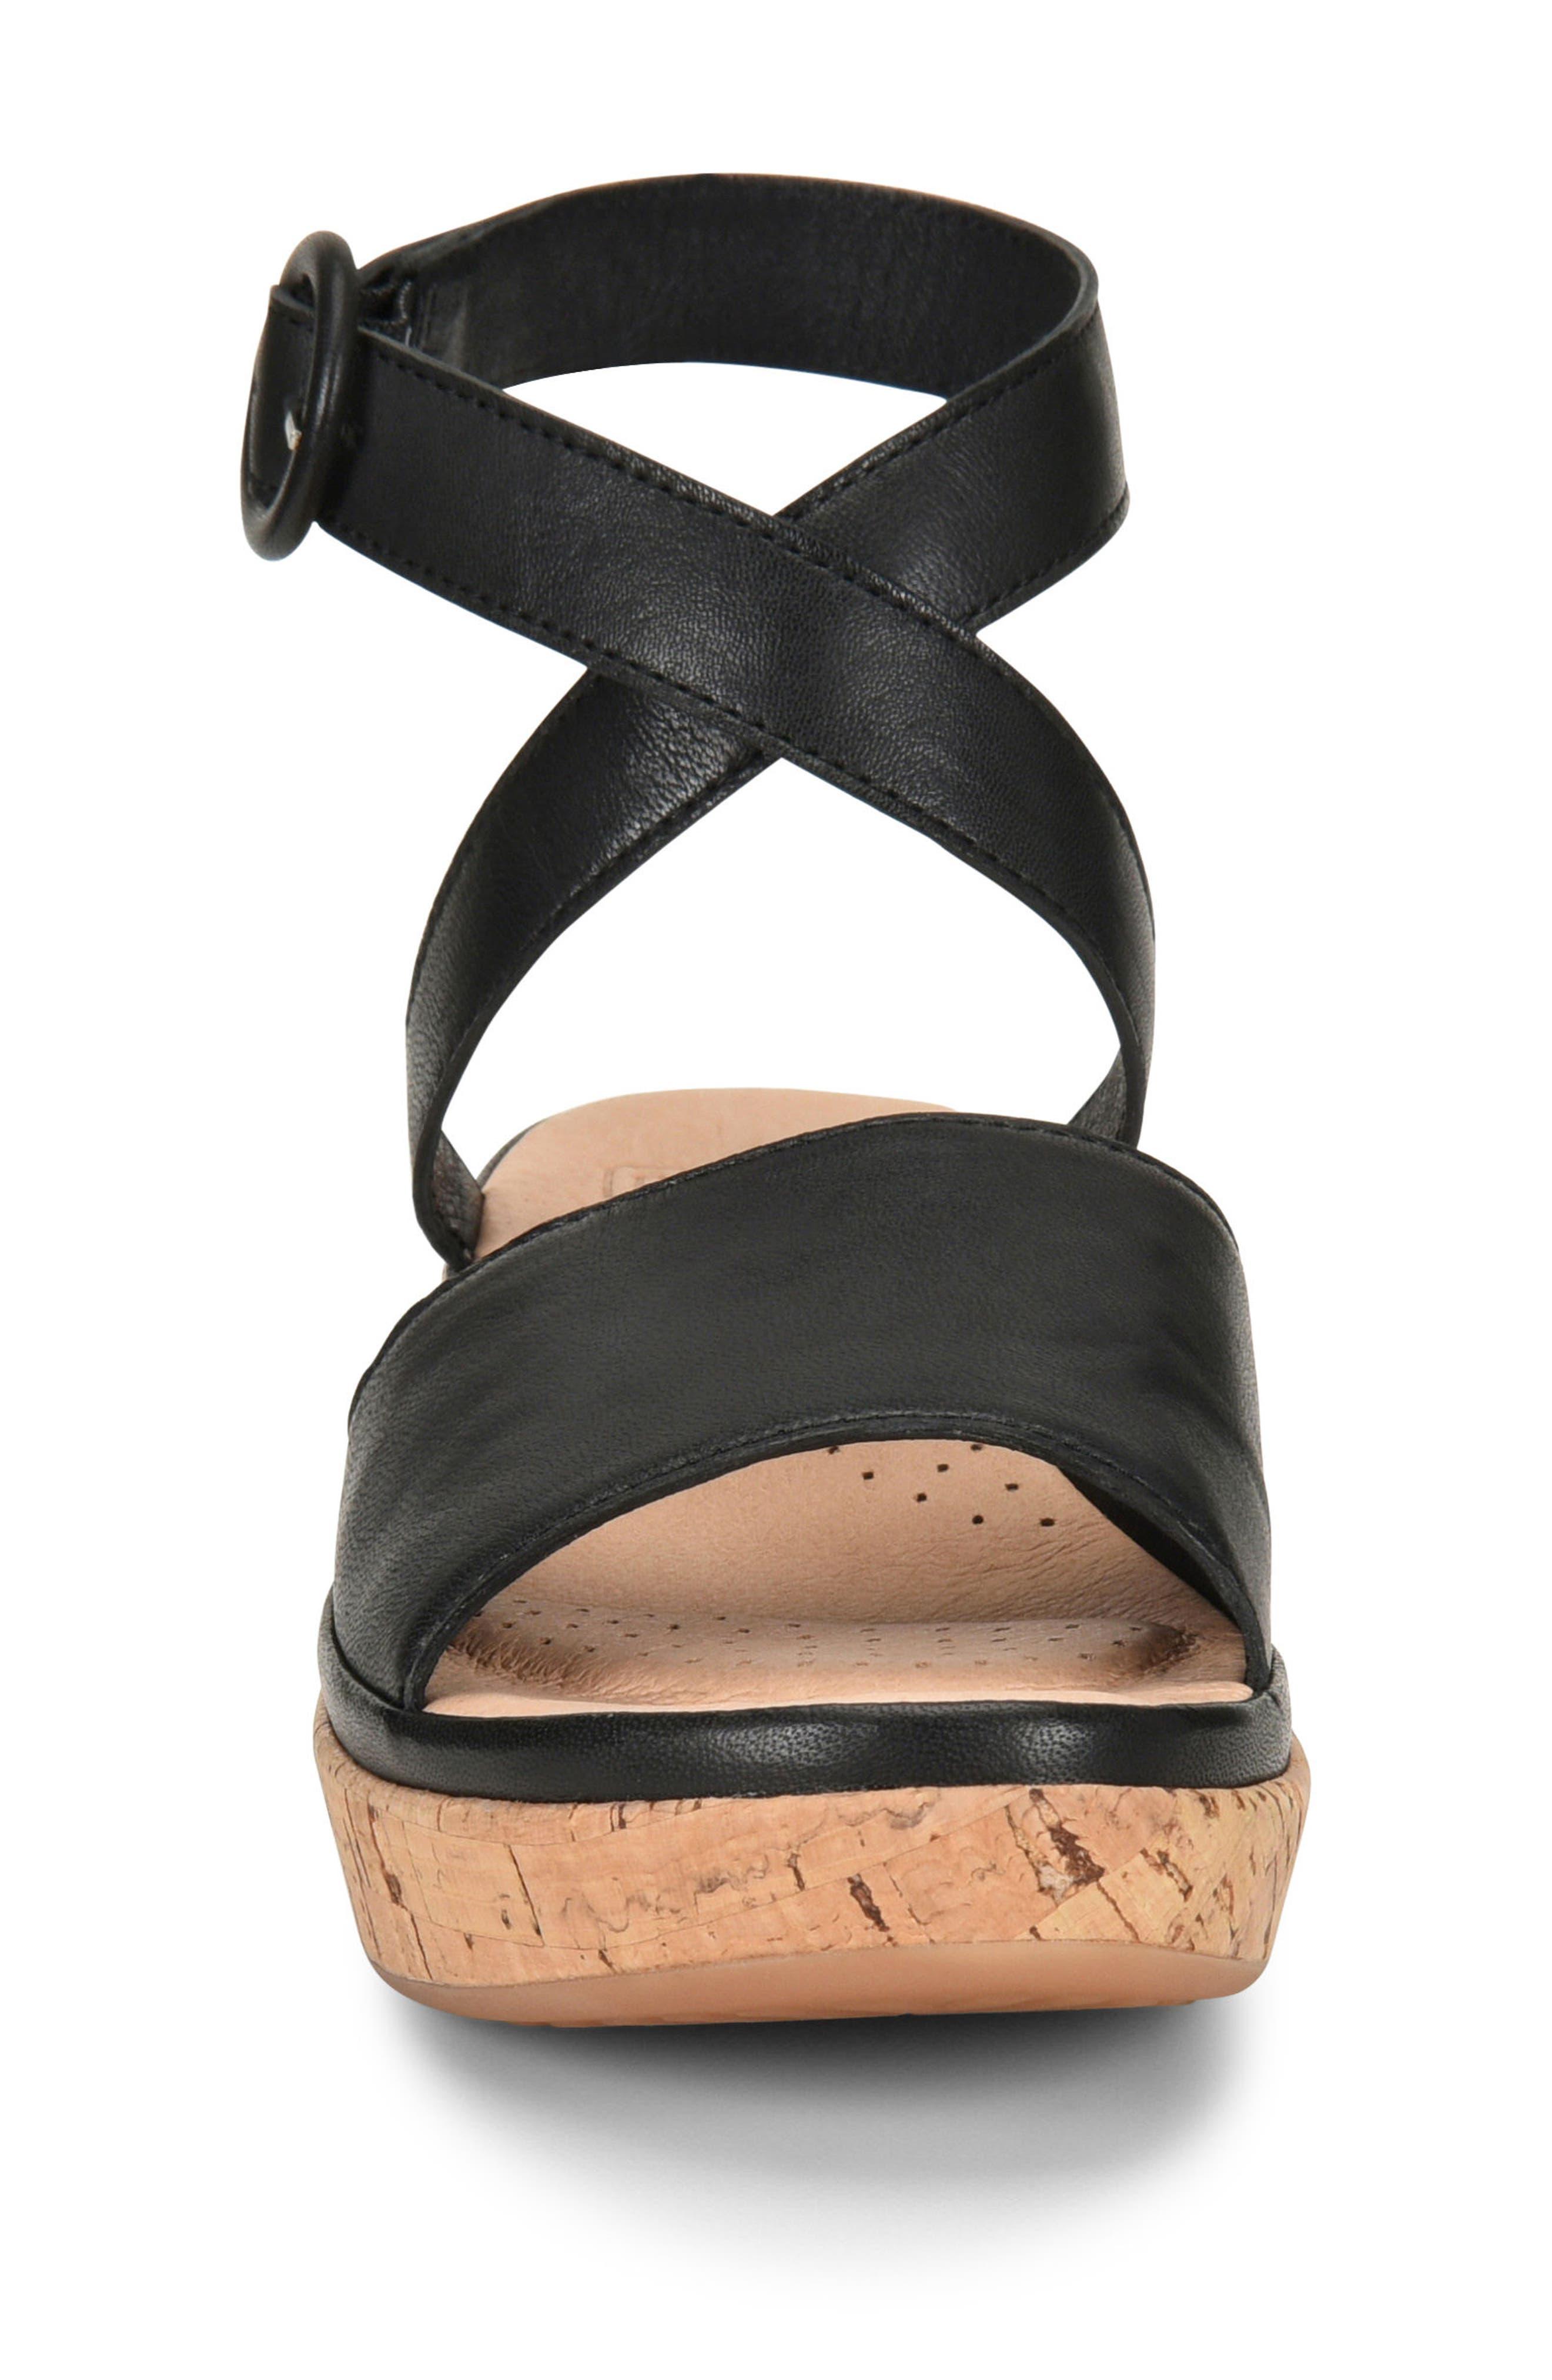 Dreamy Platform Wedge Sandal,                             Alternate thumbnail 4, color,                             Black Leather